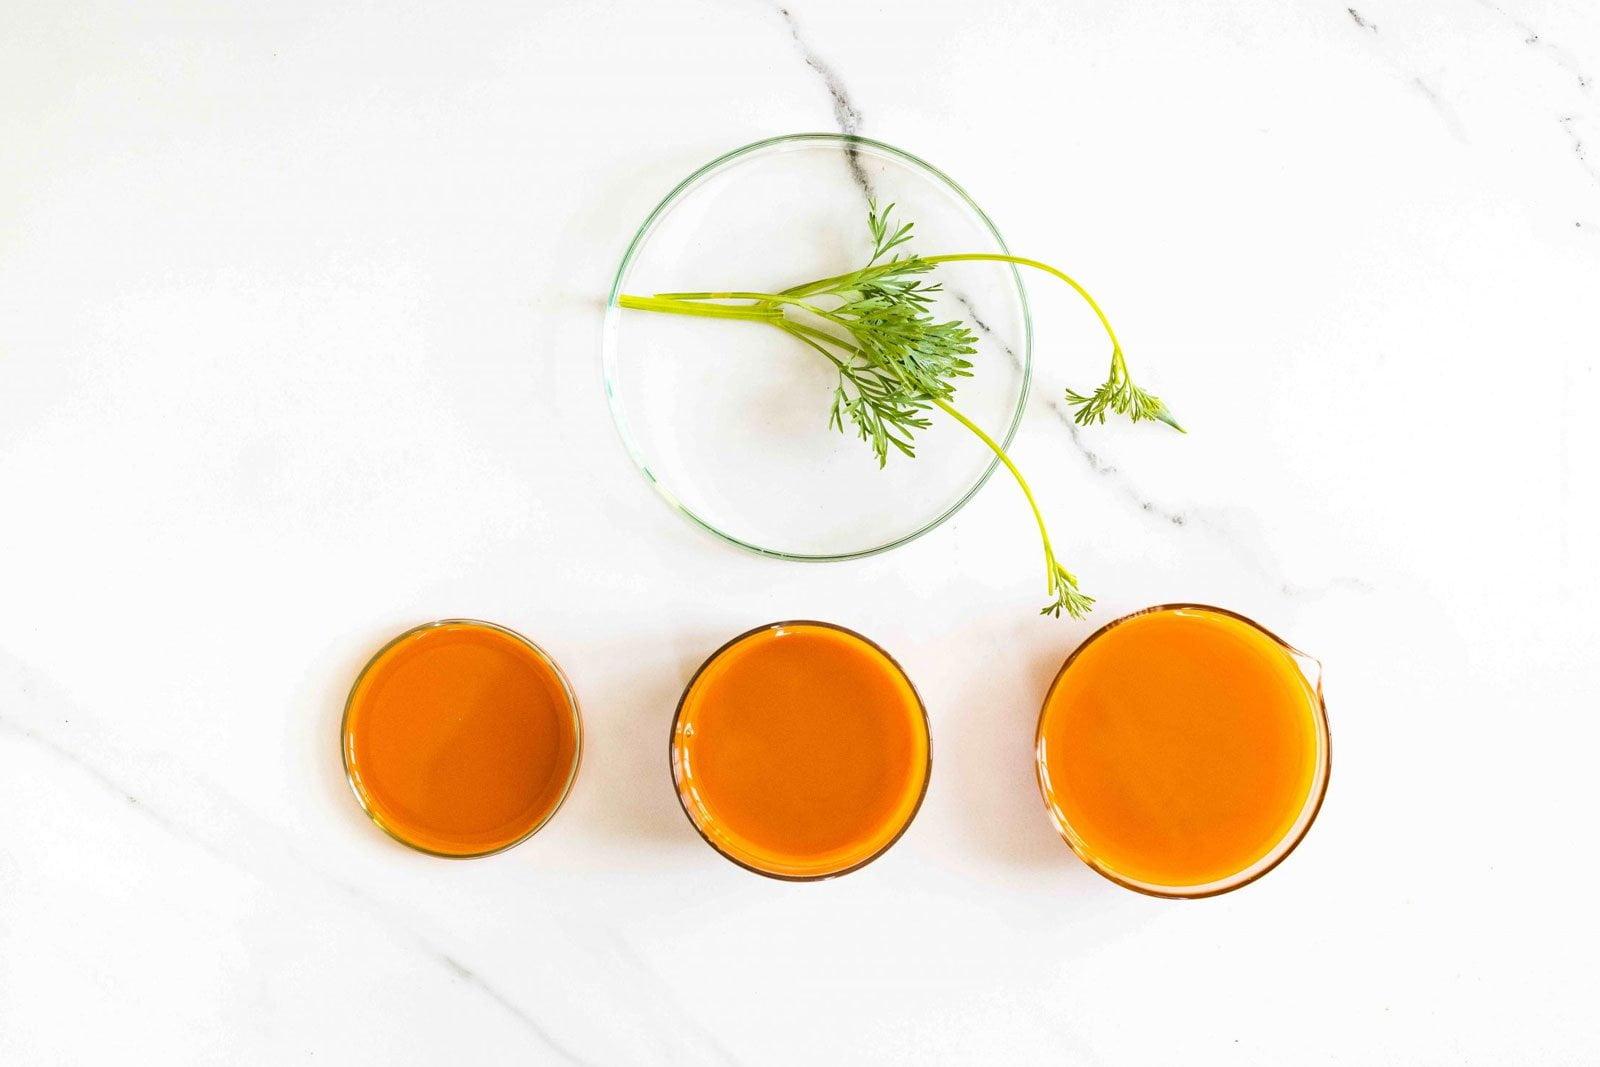 Beta carotene benefits for your skin